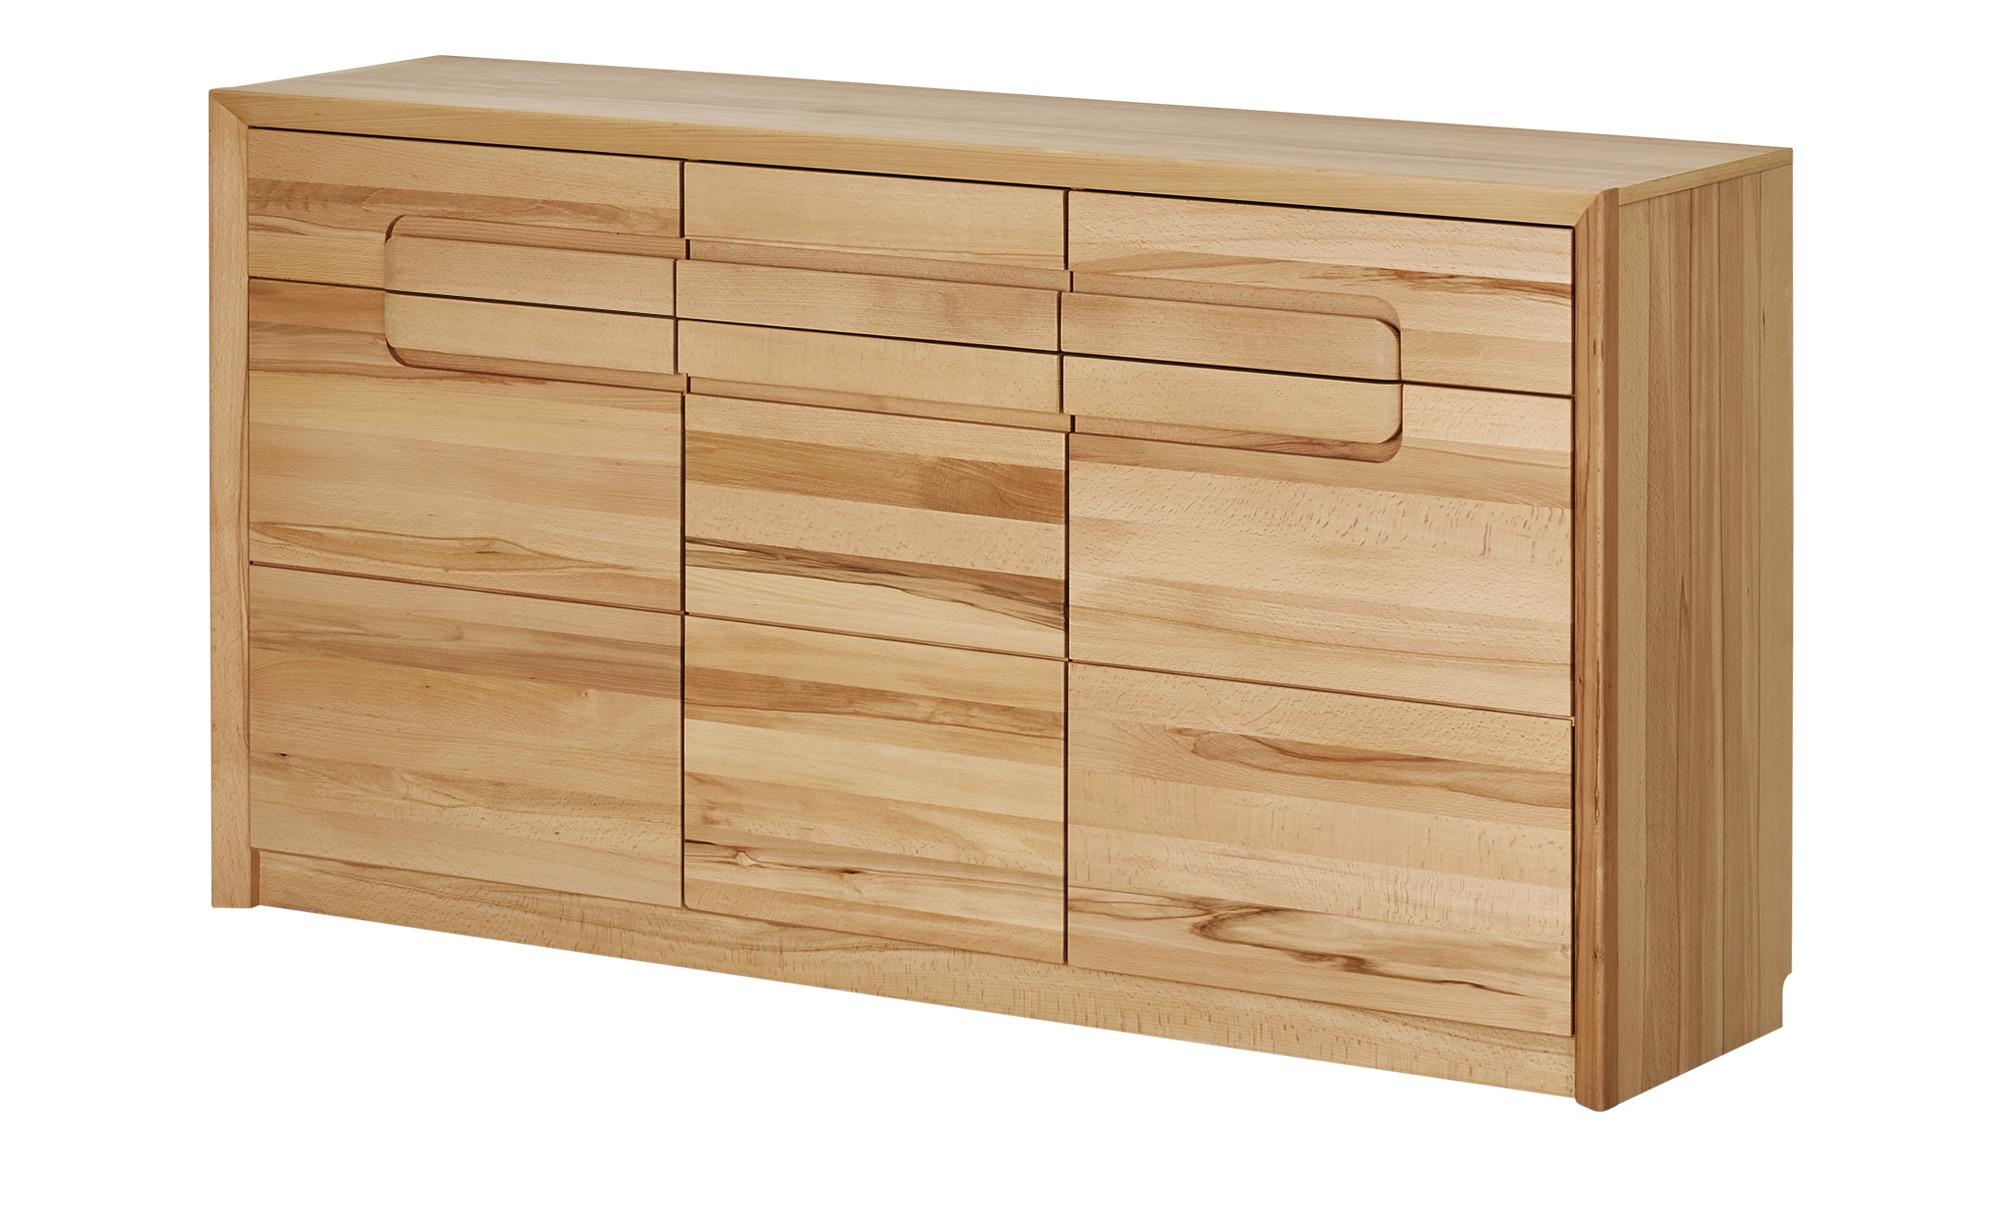 Woodford Sideboard  Oslo ¦ Maße (cm): B: 164 H: 89 T: 42 Kommoden & Sideboards > Sideboards - Höffner